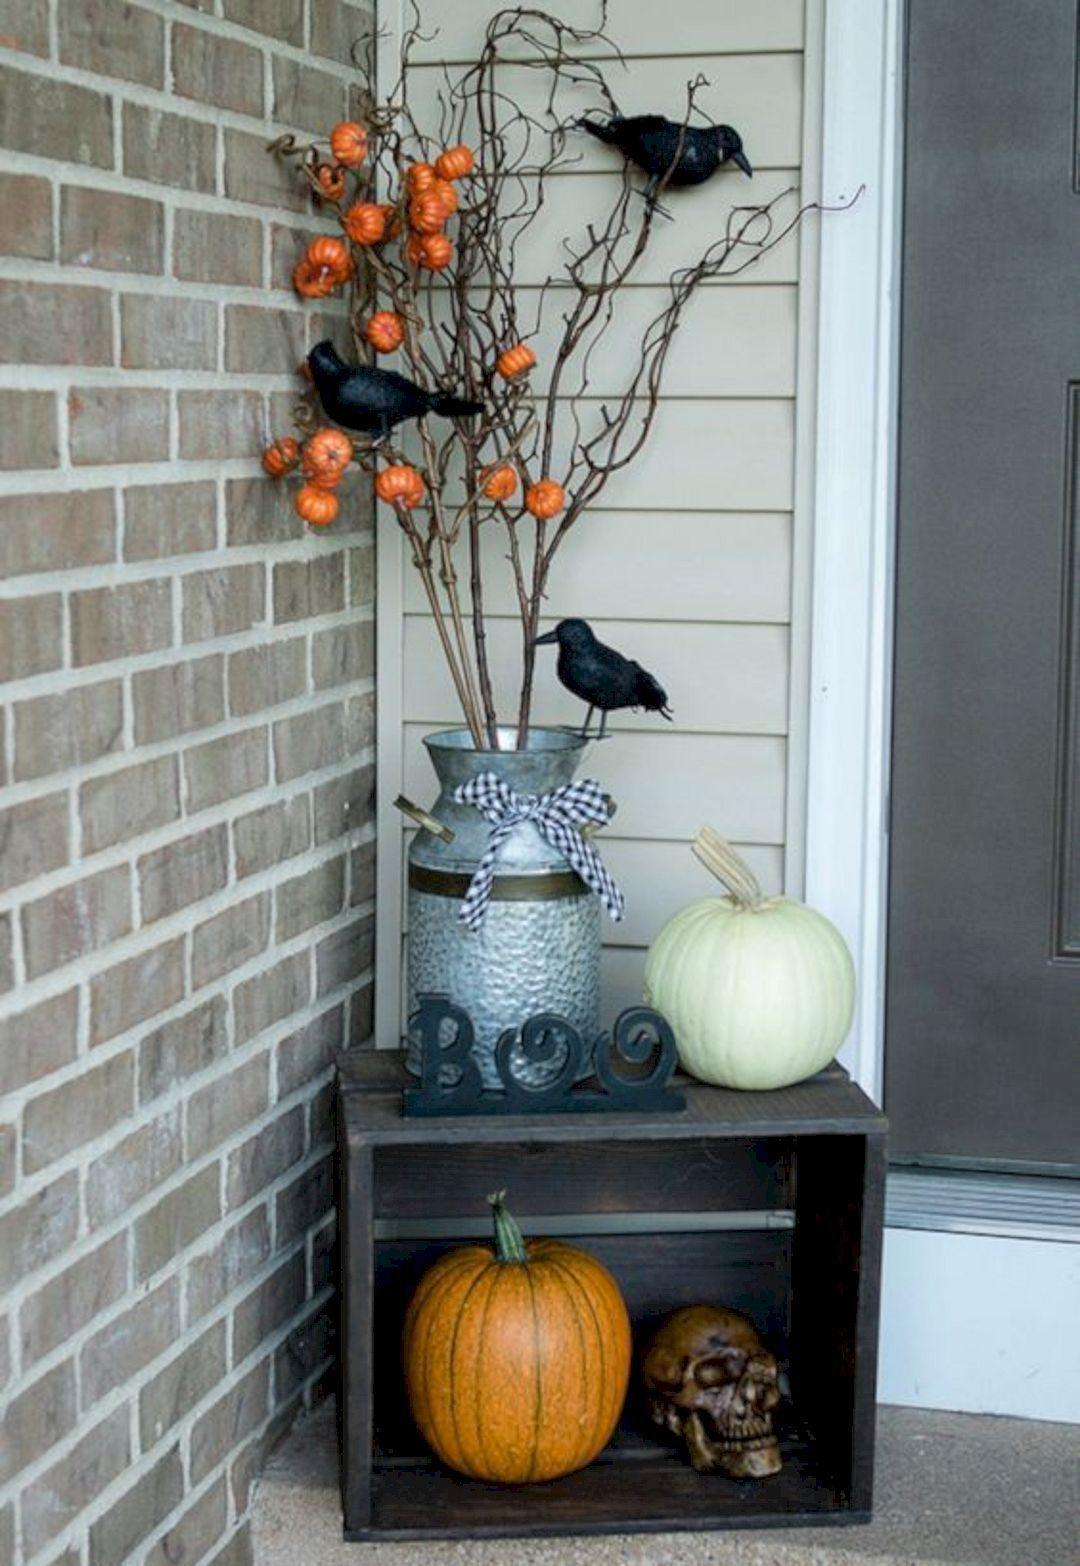 11 Incredible Bathroom Decorating Ideas Fall Halloween Decor Halloween Front Porch Decor Fall Decorations Porch